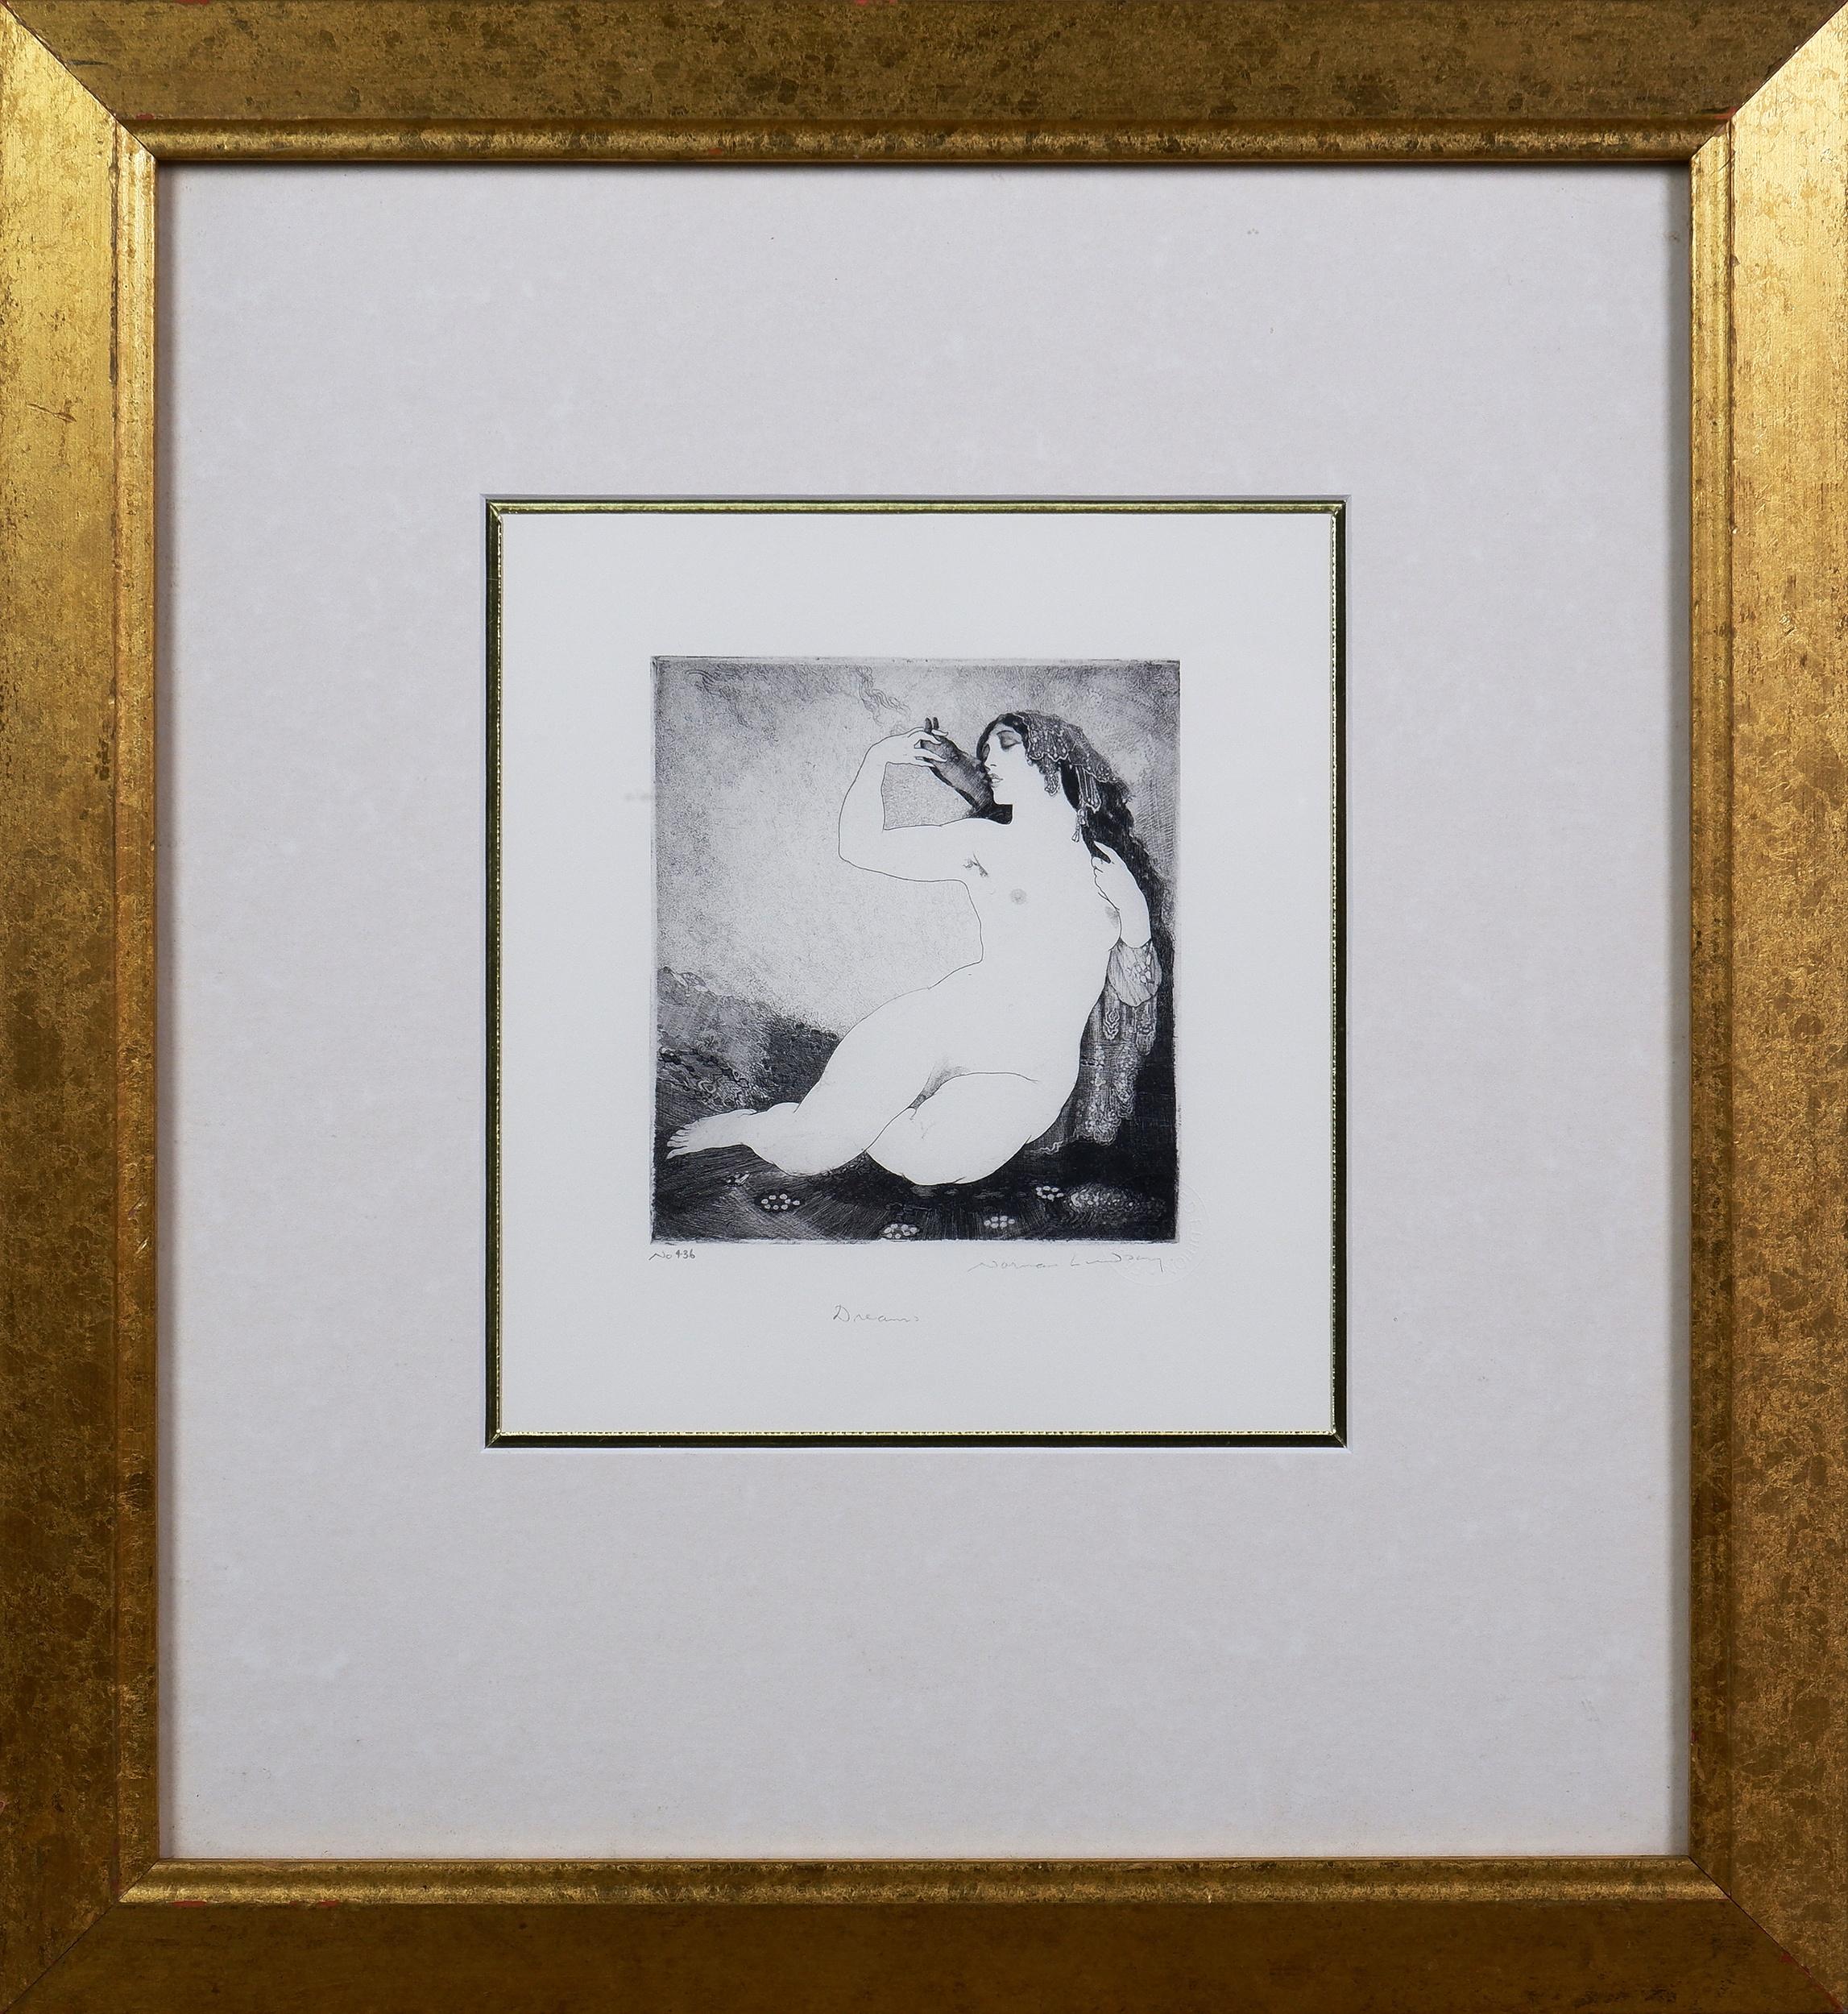 'Norman Lindsay (1879-1969), Dreams, Facsimilie Etching'